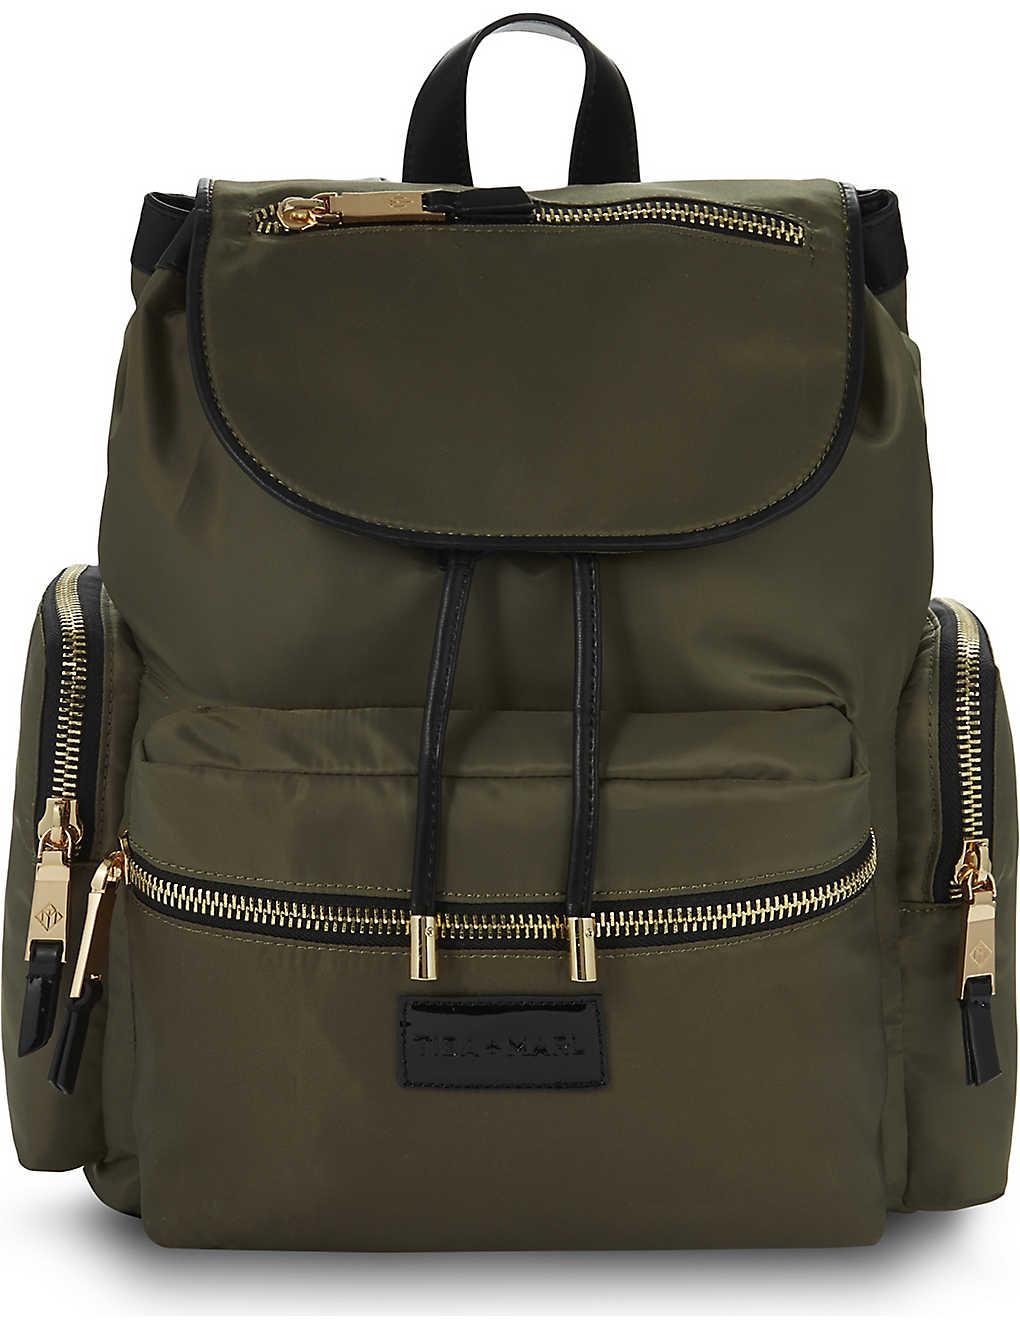 24d70fa557be4 TIBA + MARL - Kaspar nylon knapsack | Selfridges.com